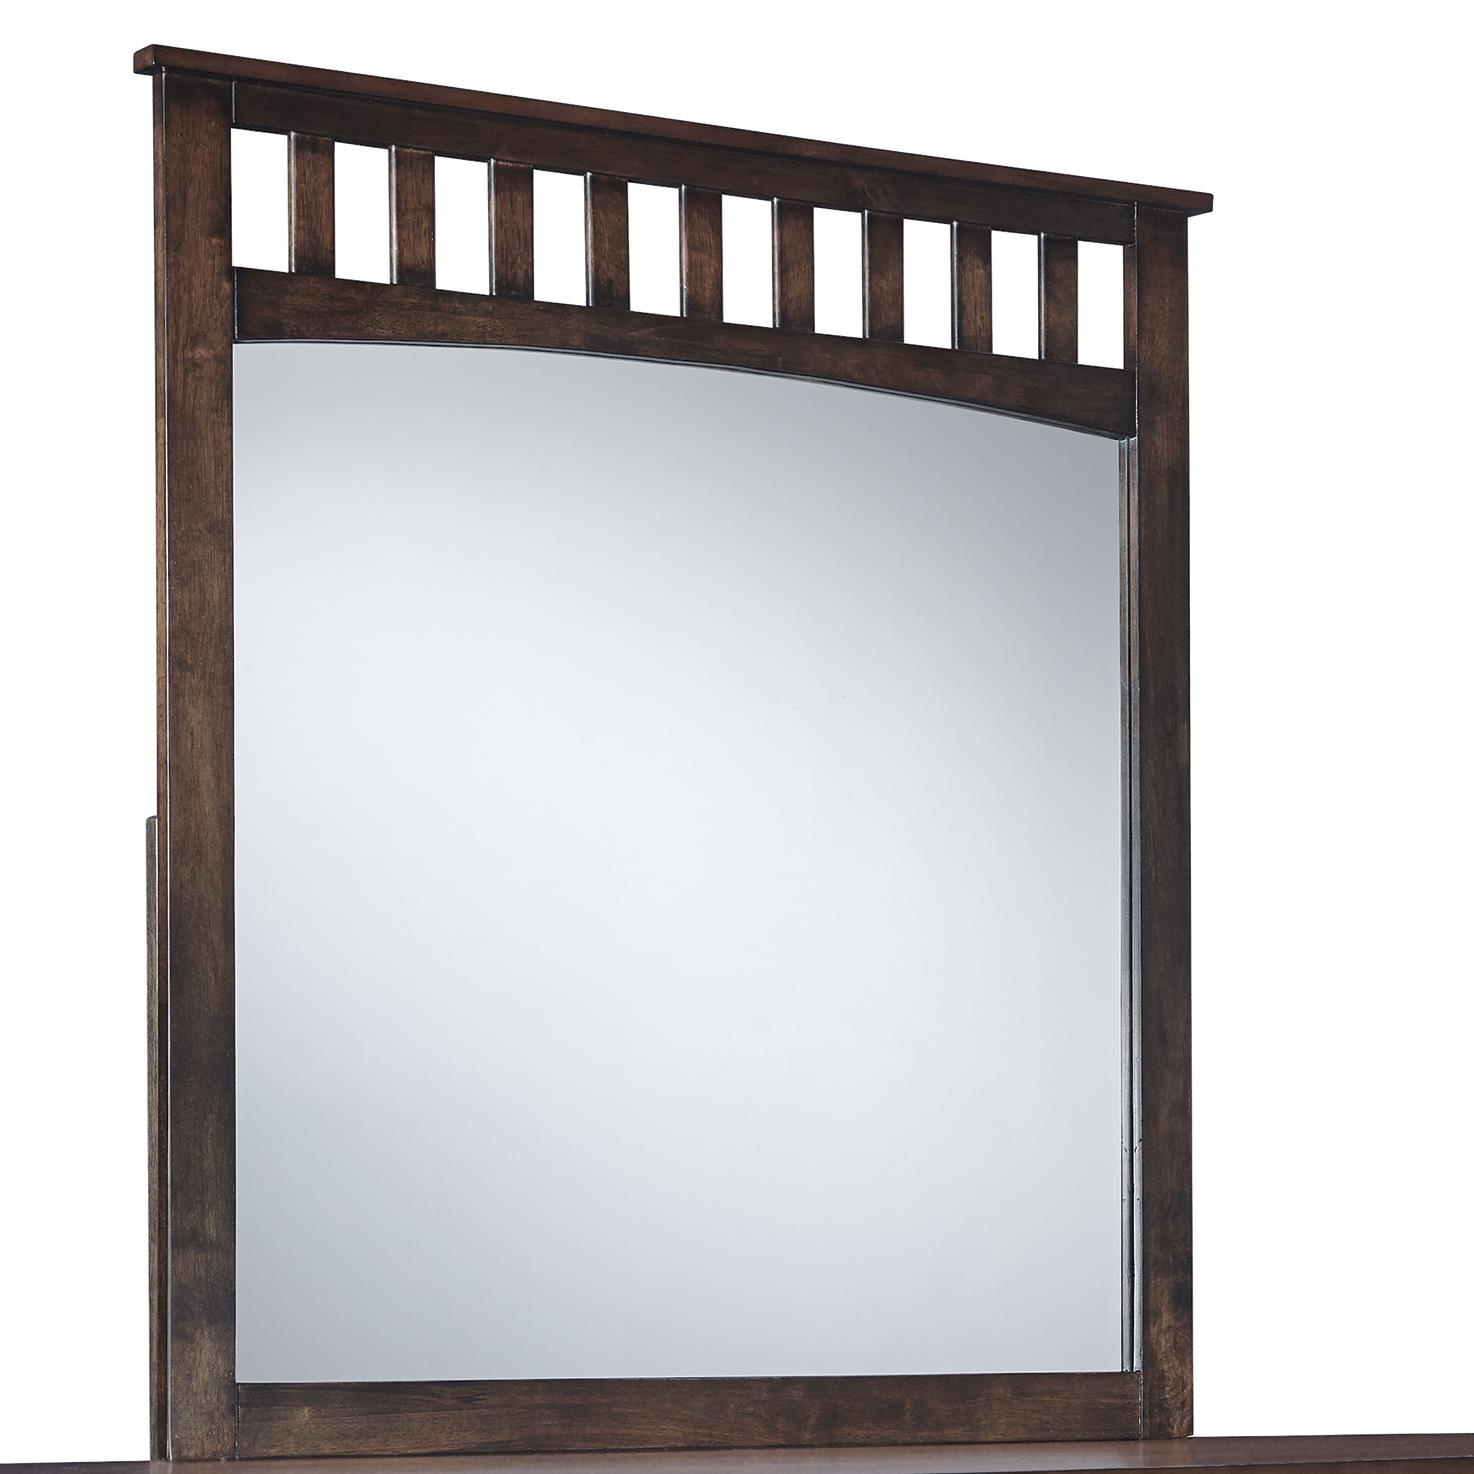 Signature Design by Ashley Strenton Bedroom Mirror - Item Number: B568-36